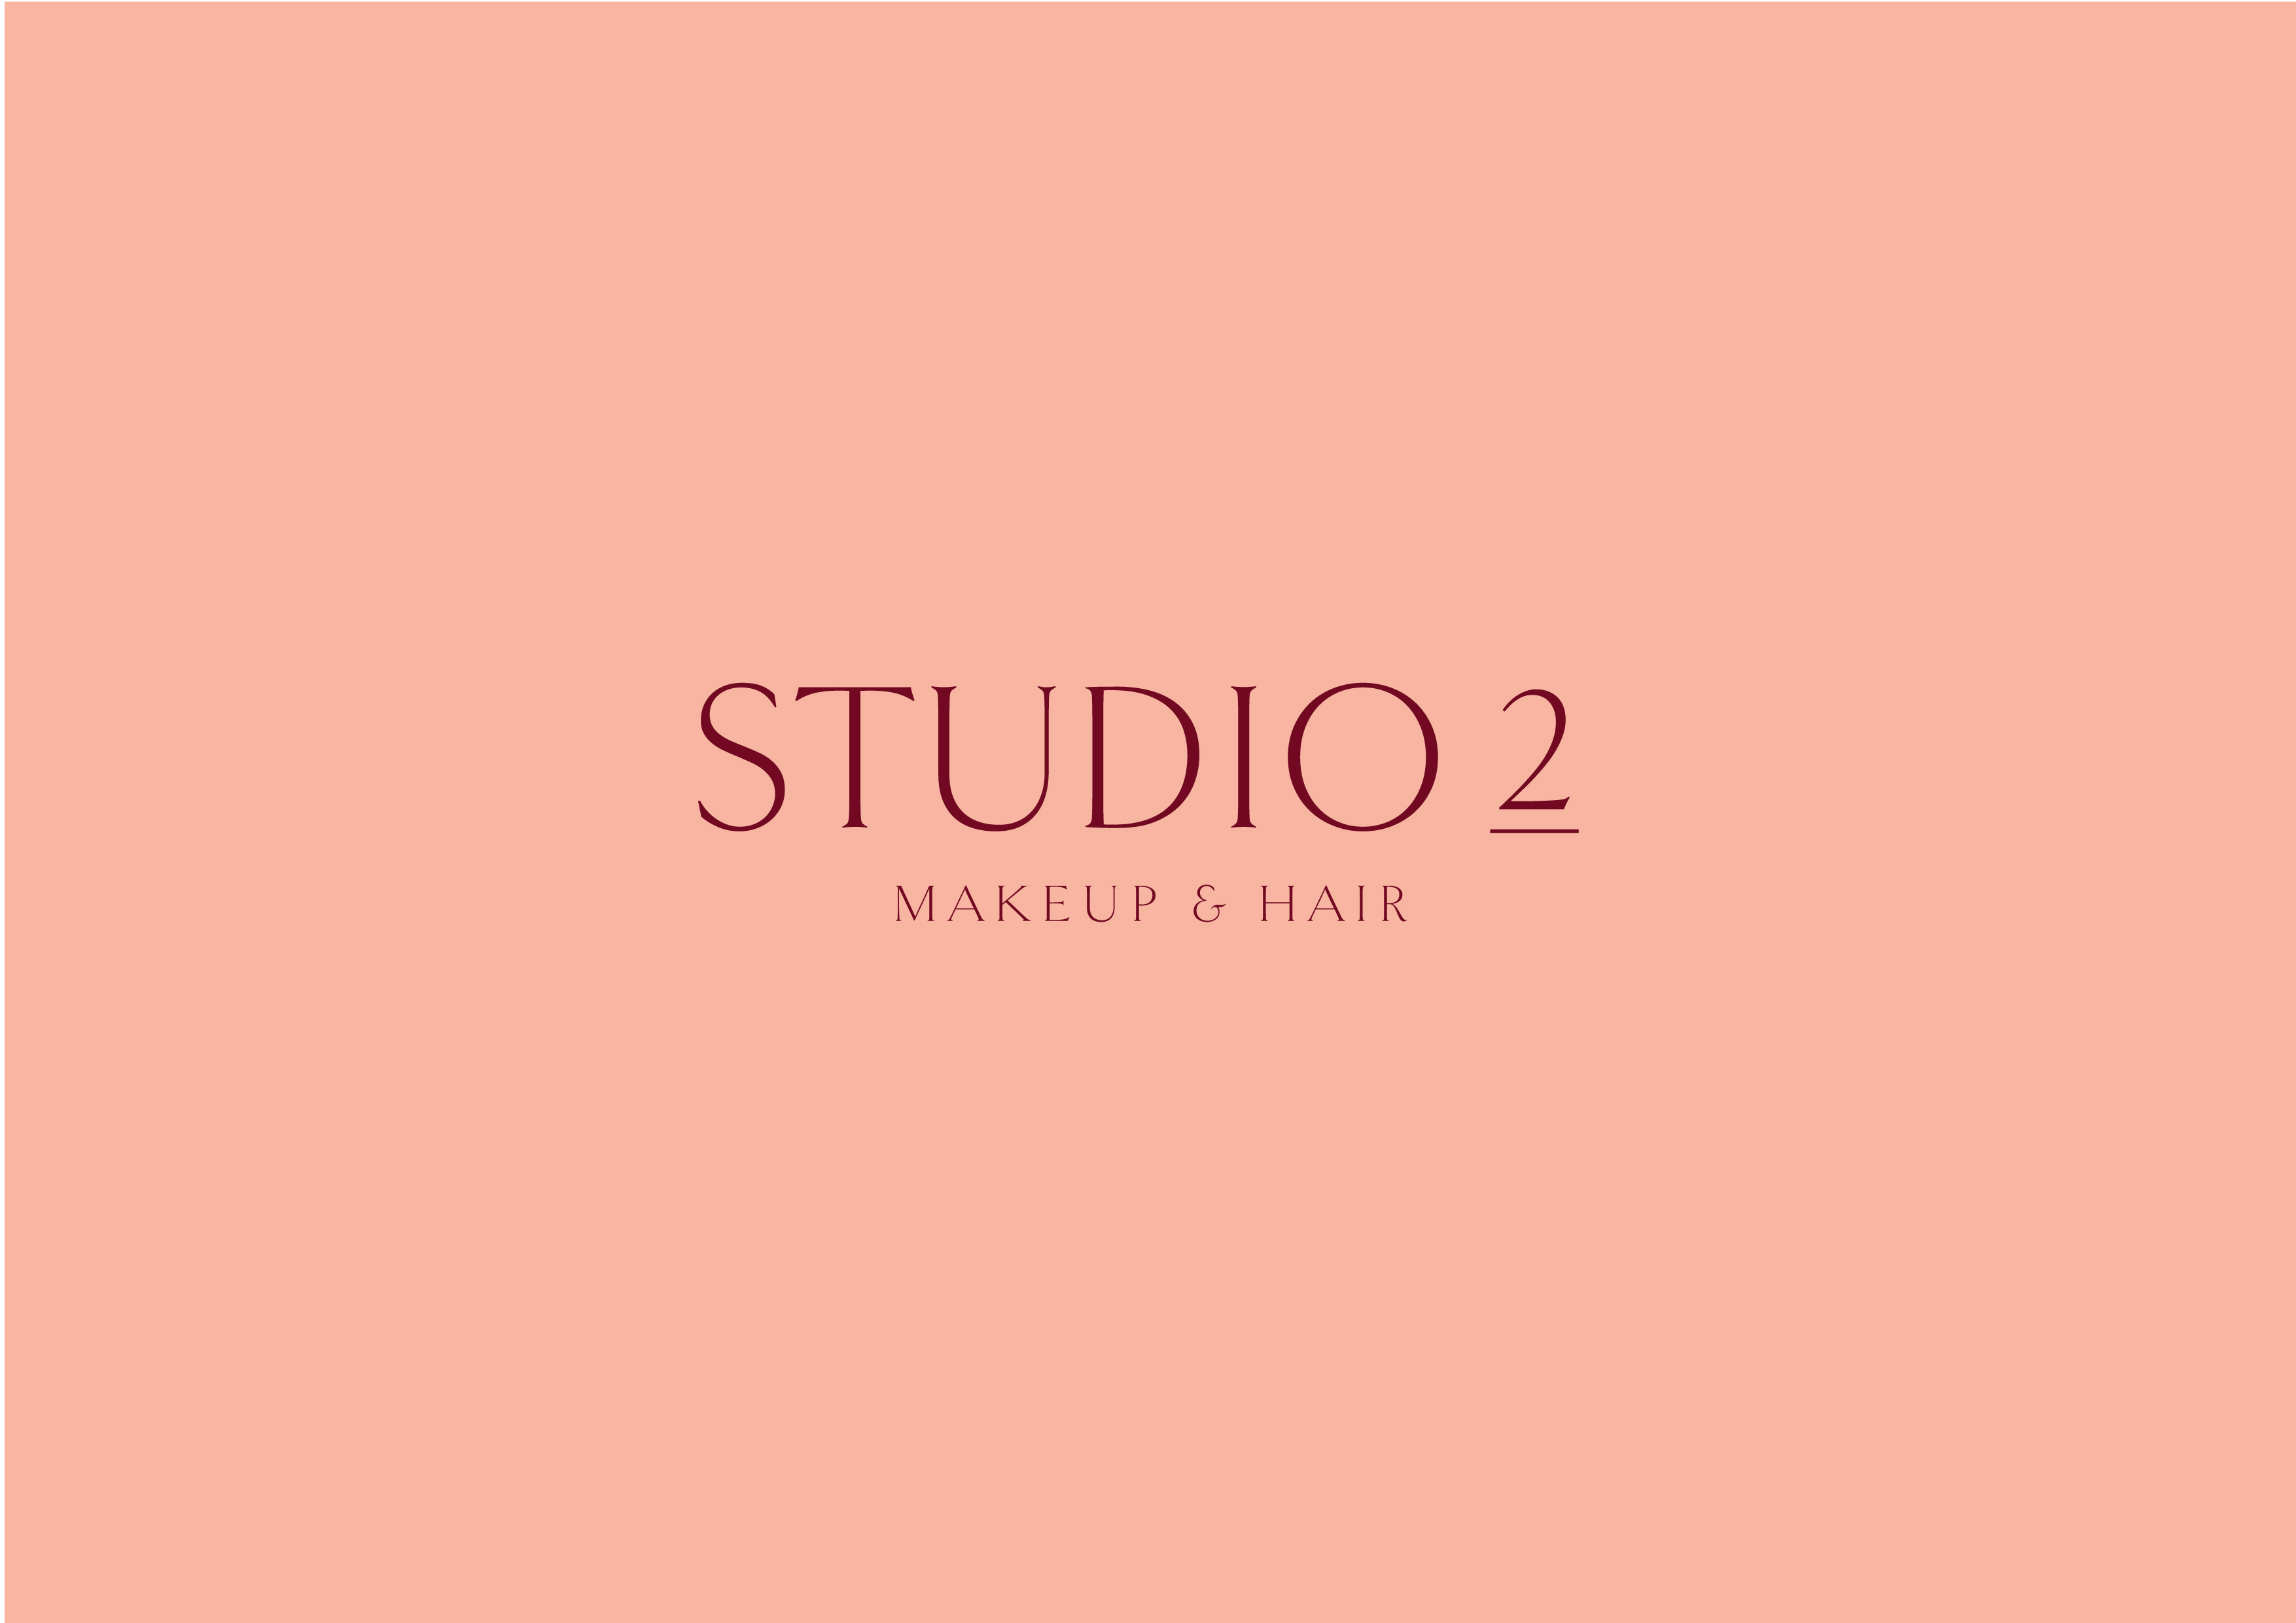 Studio 2 Brand Identity, logo design, styleguide, Studio Mimi Moon